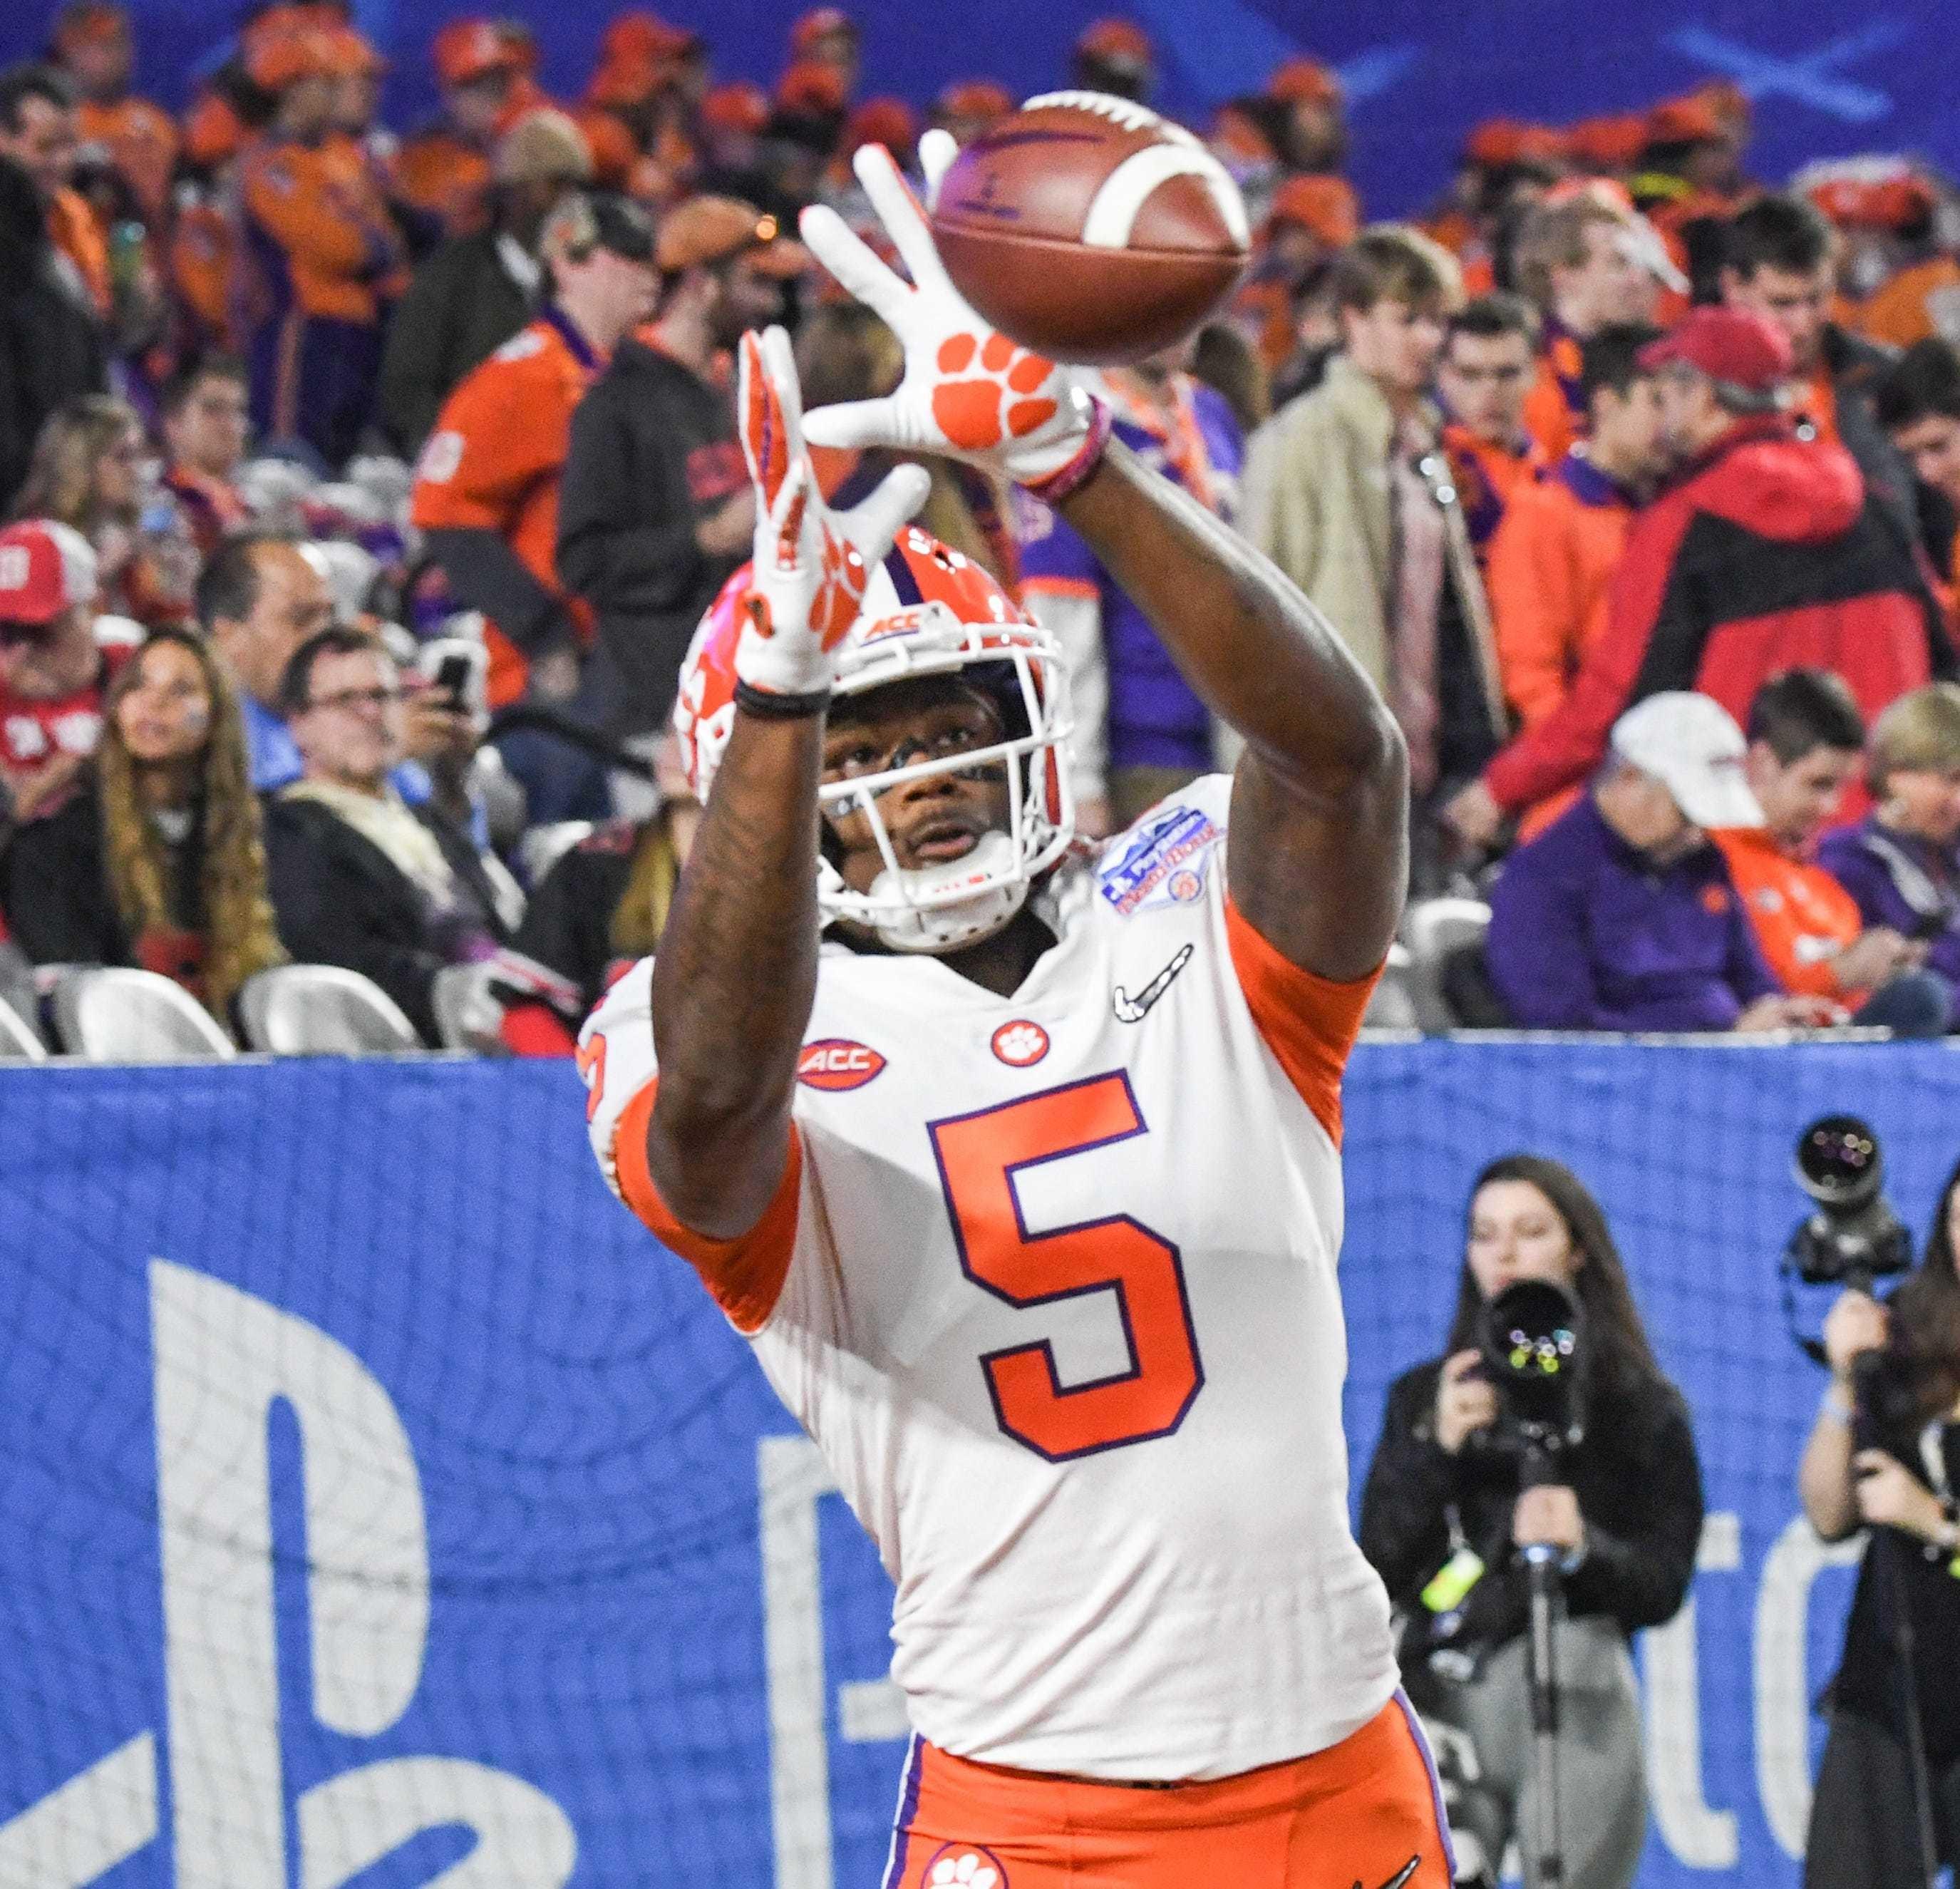 2021 NFL Draft Odds: Trevor Lawrence Favored to Be No. 1 ...